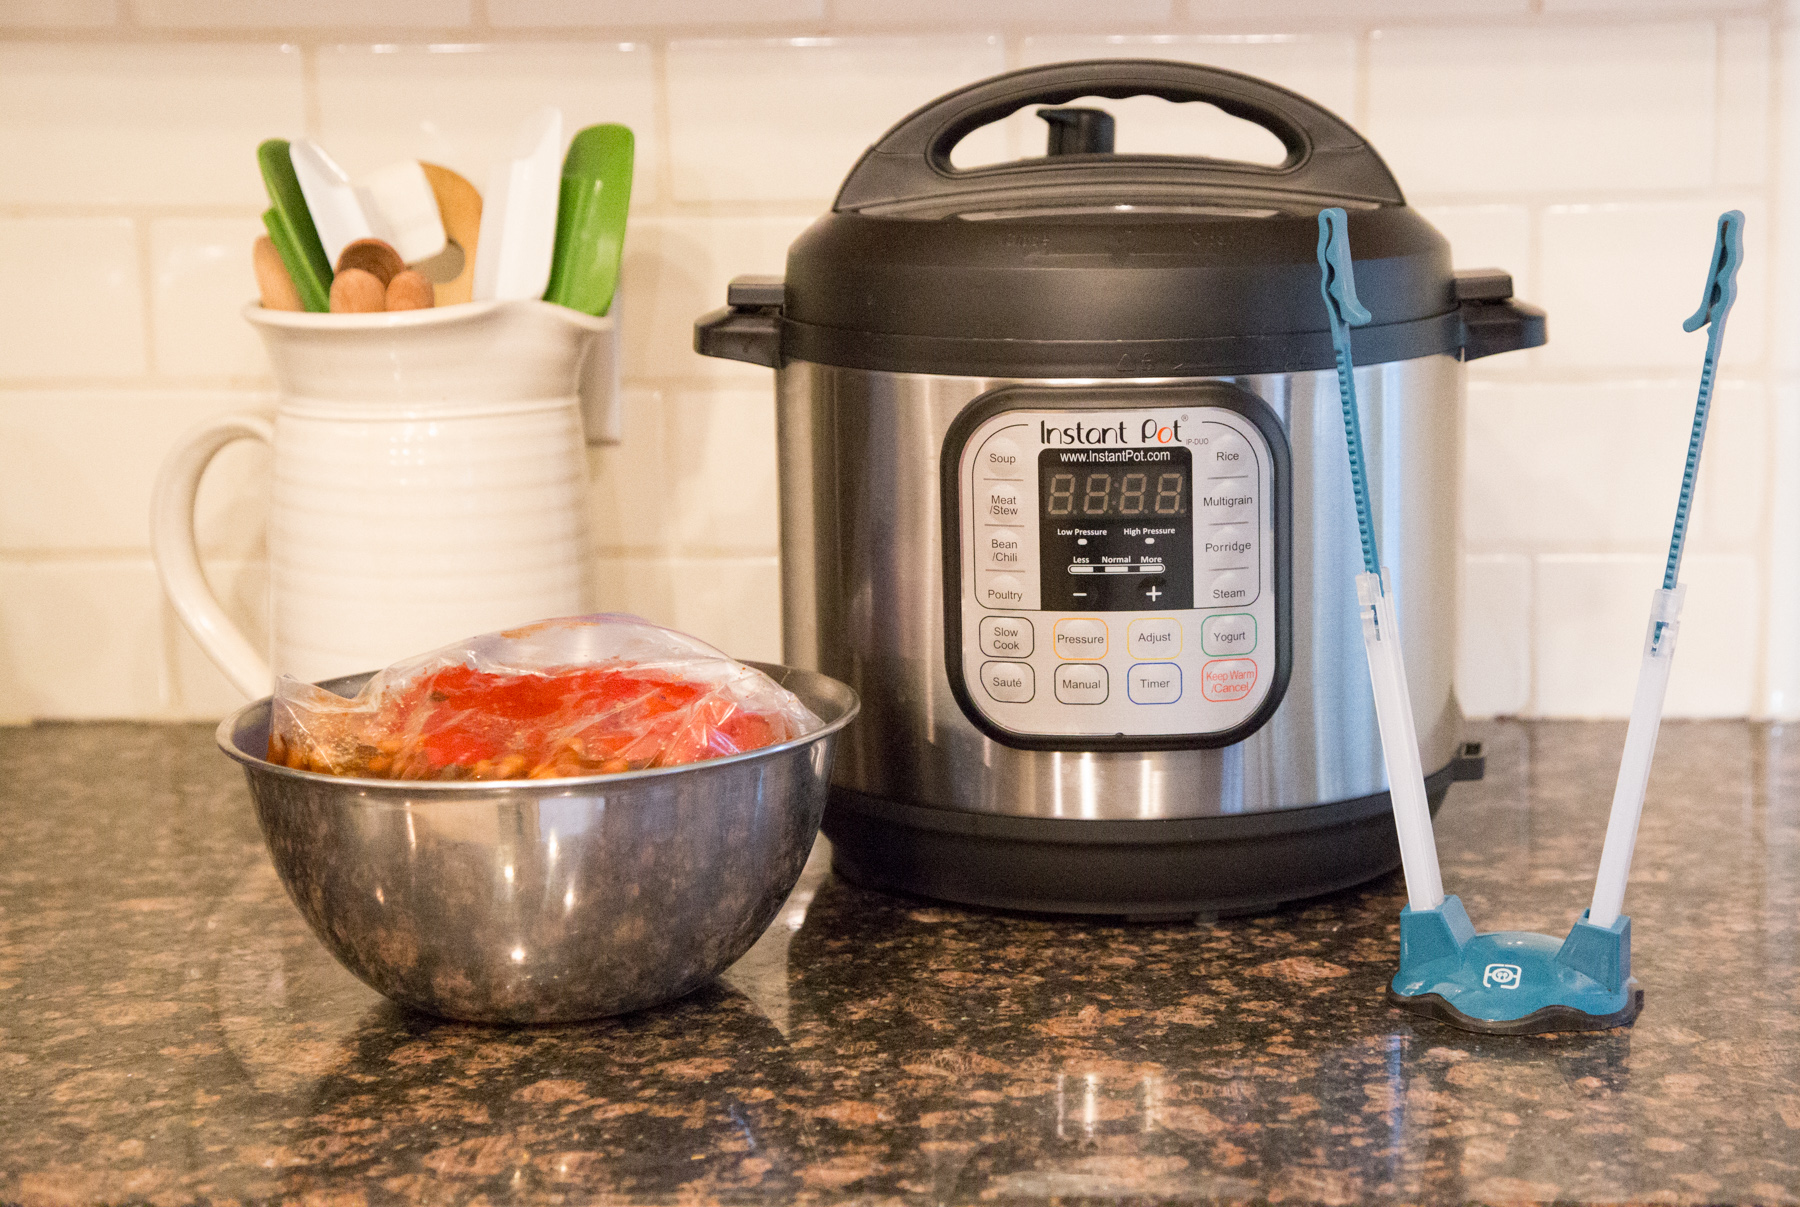 Freezer To Instant Pot Chili Recipe